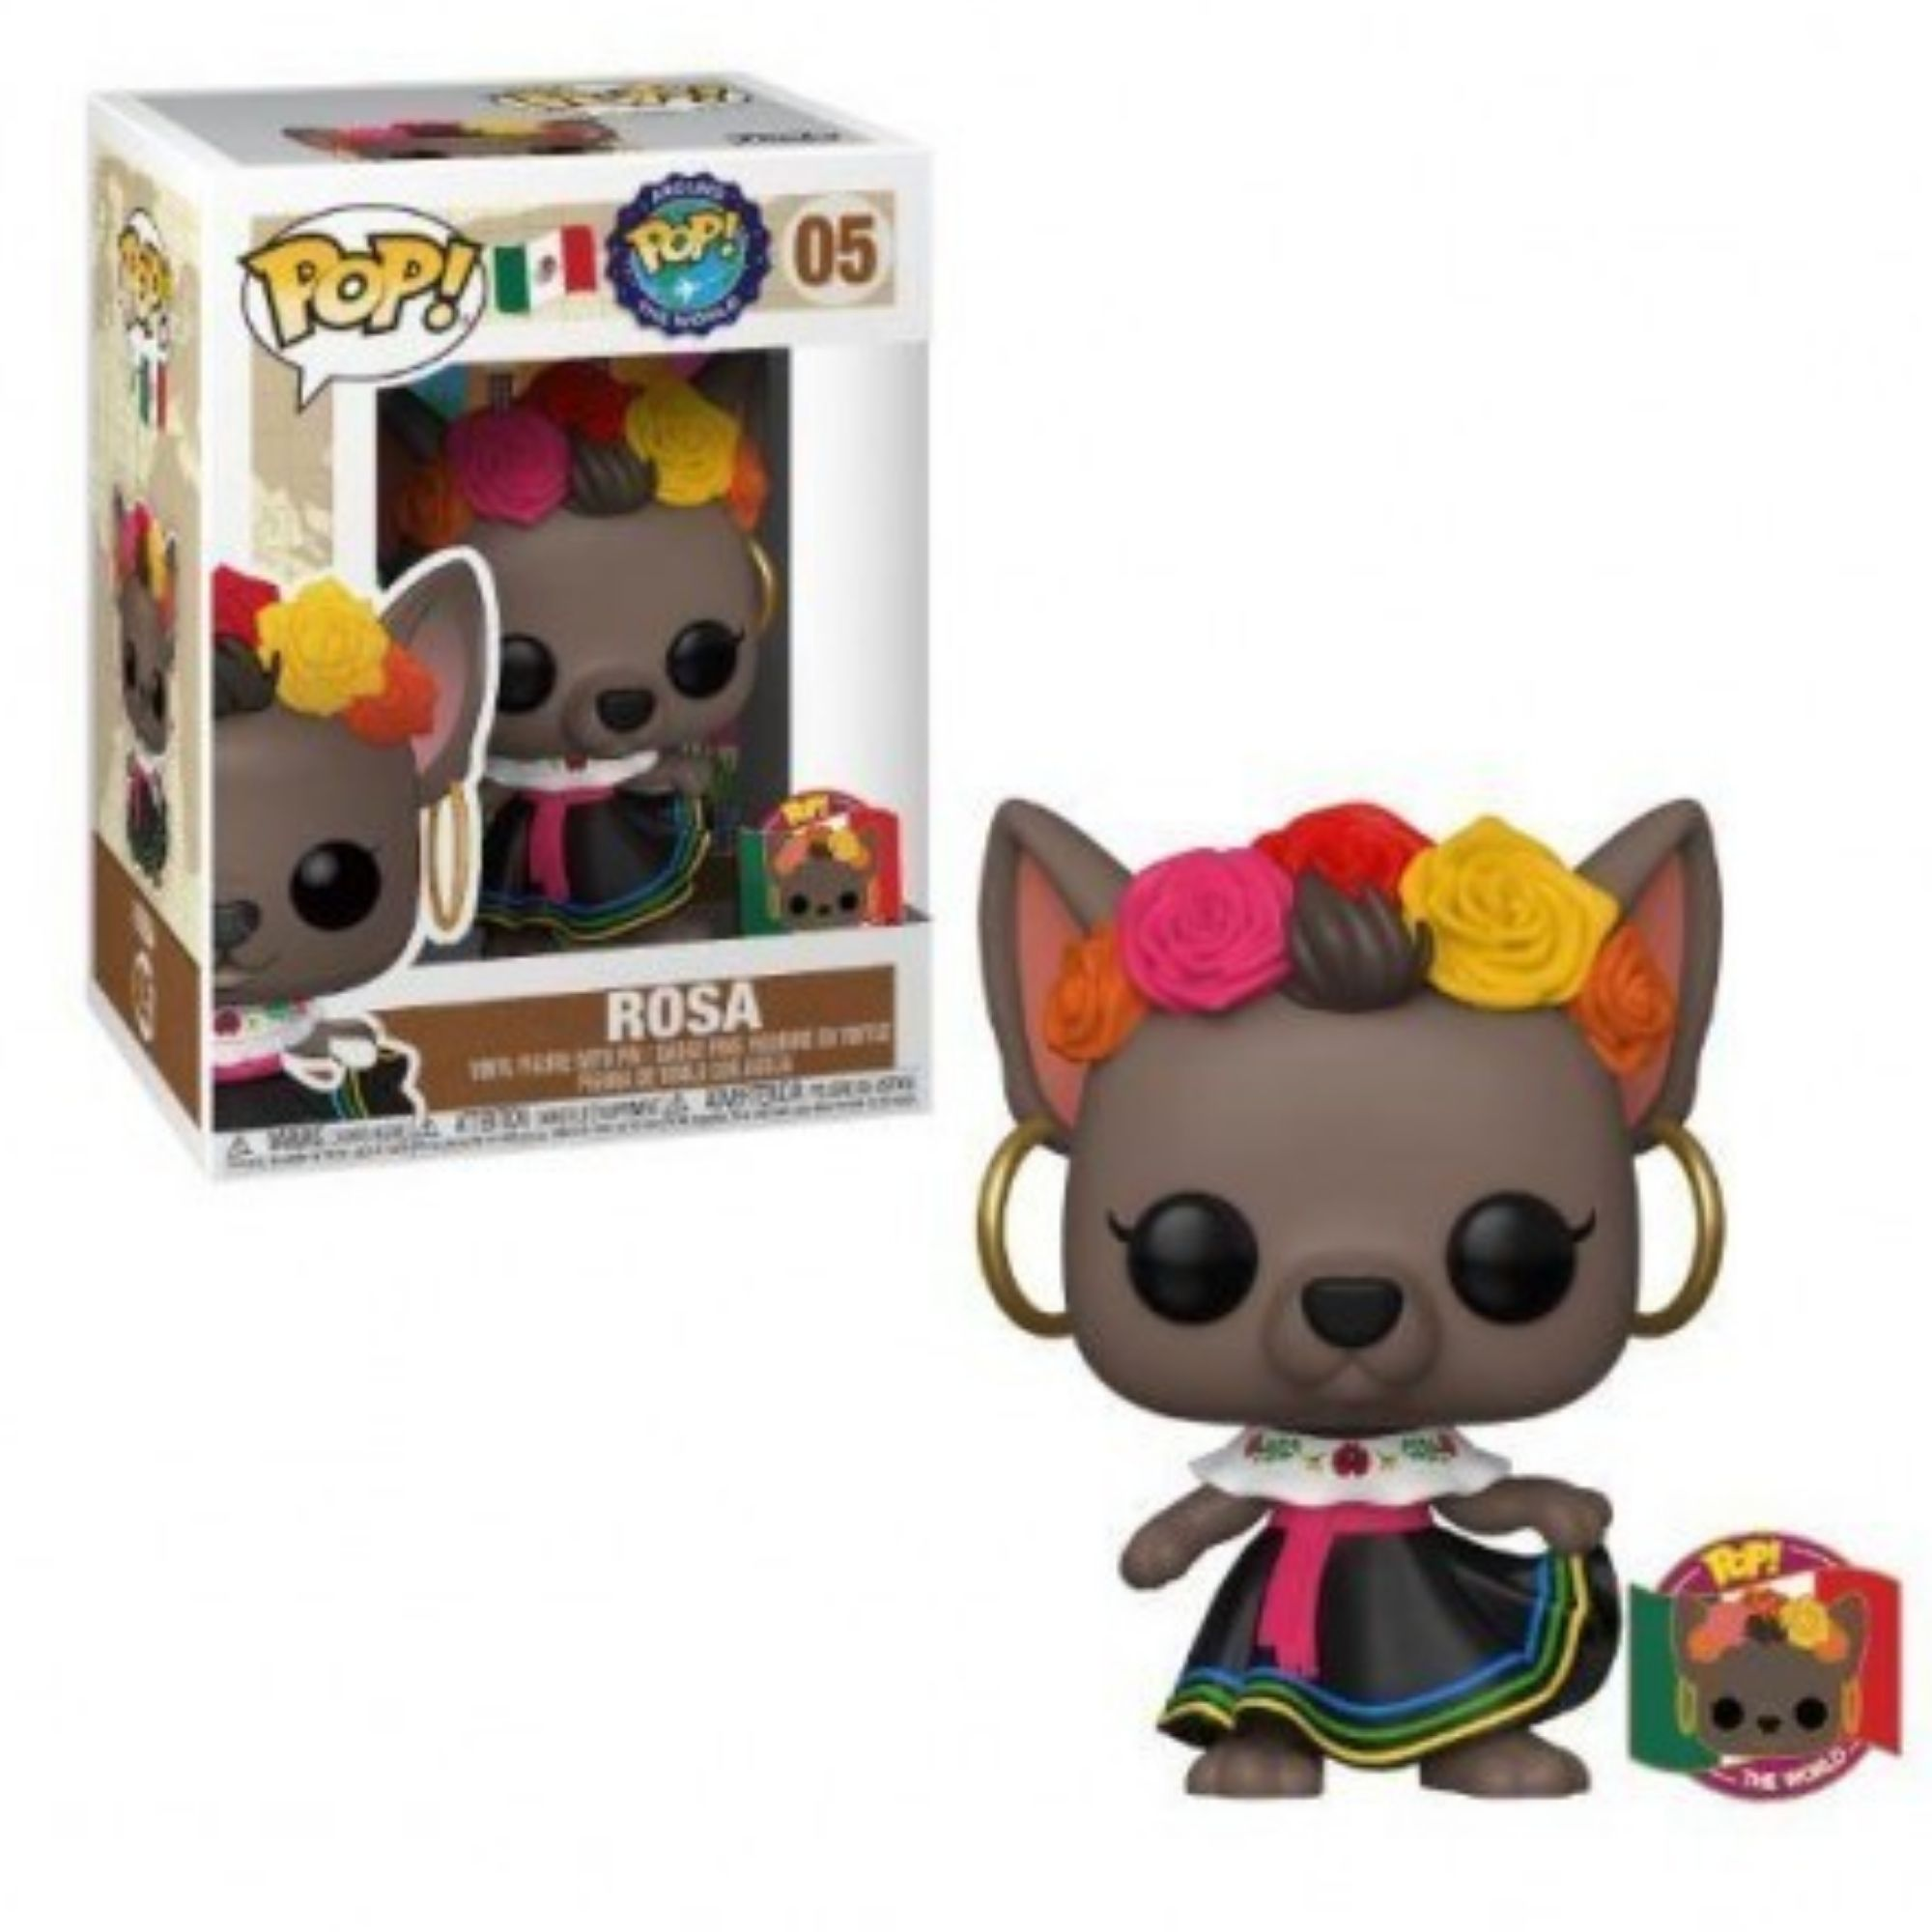 Funko Pop Rosa  #05 Around The World  - Game Land Brinquedos